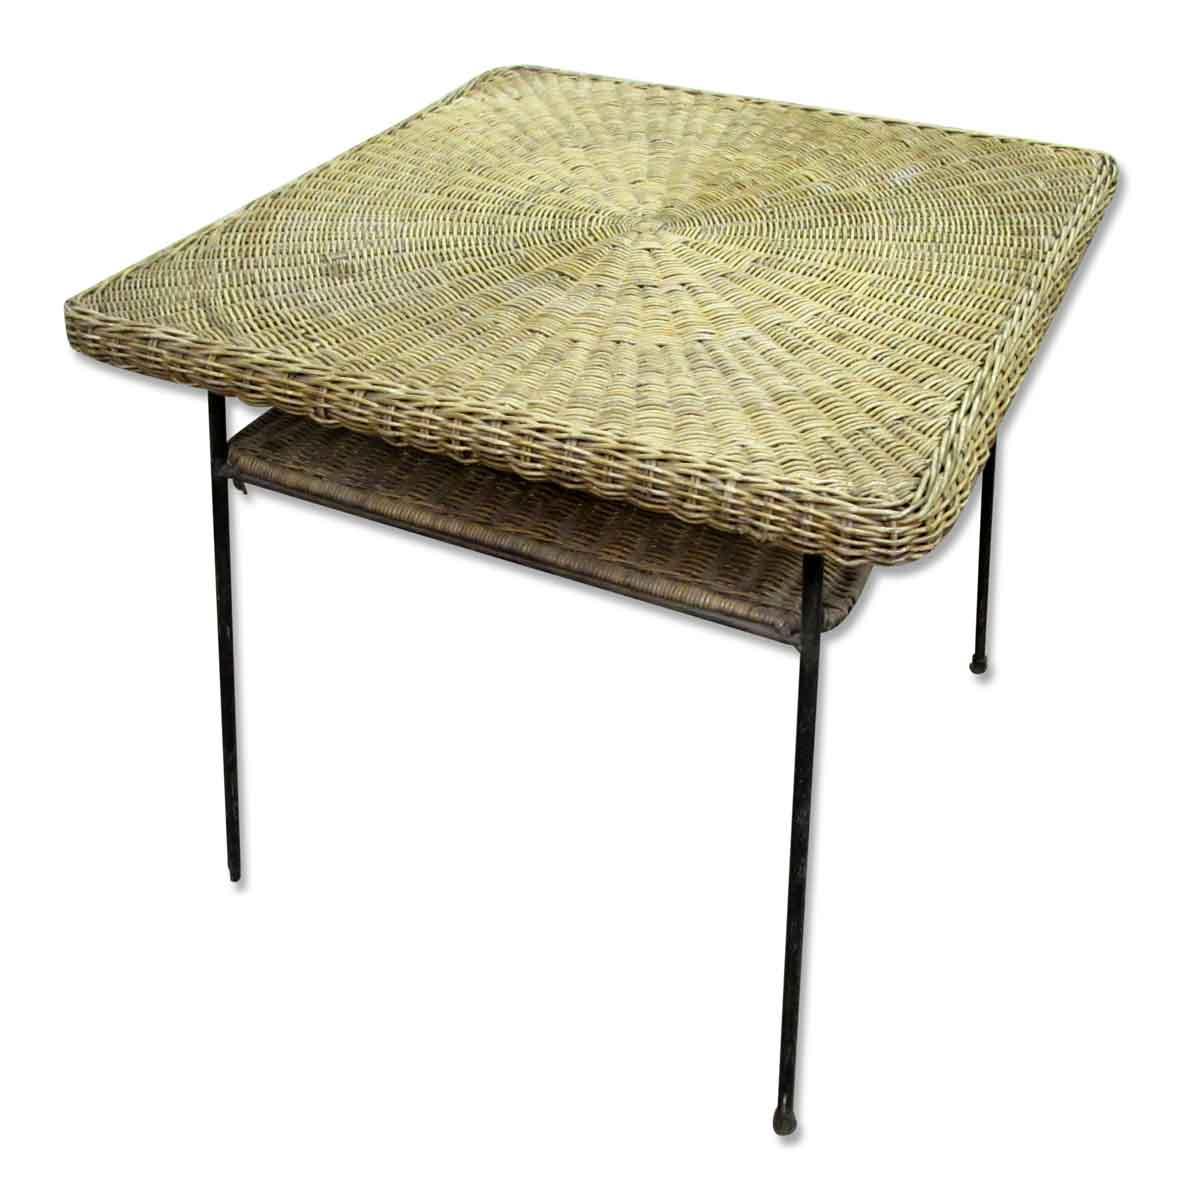 Antique Wicker Desk